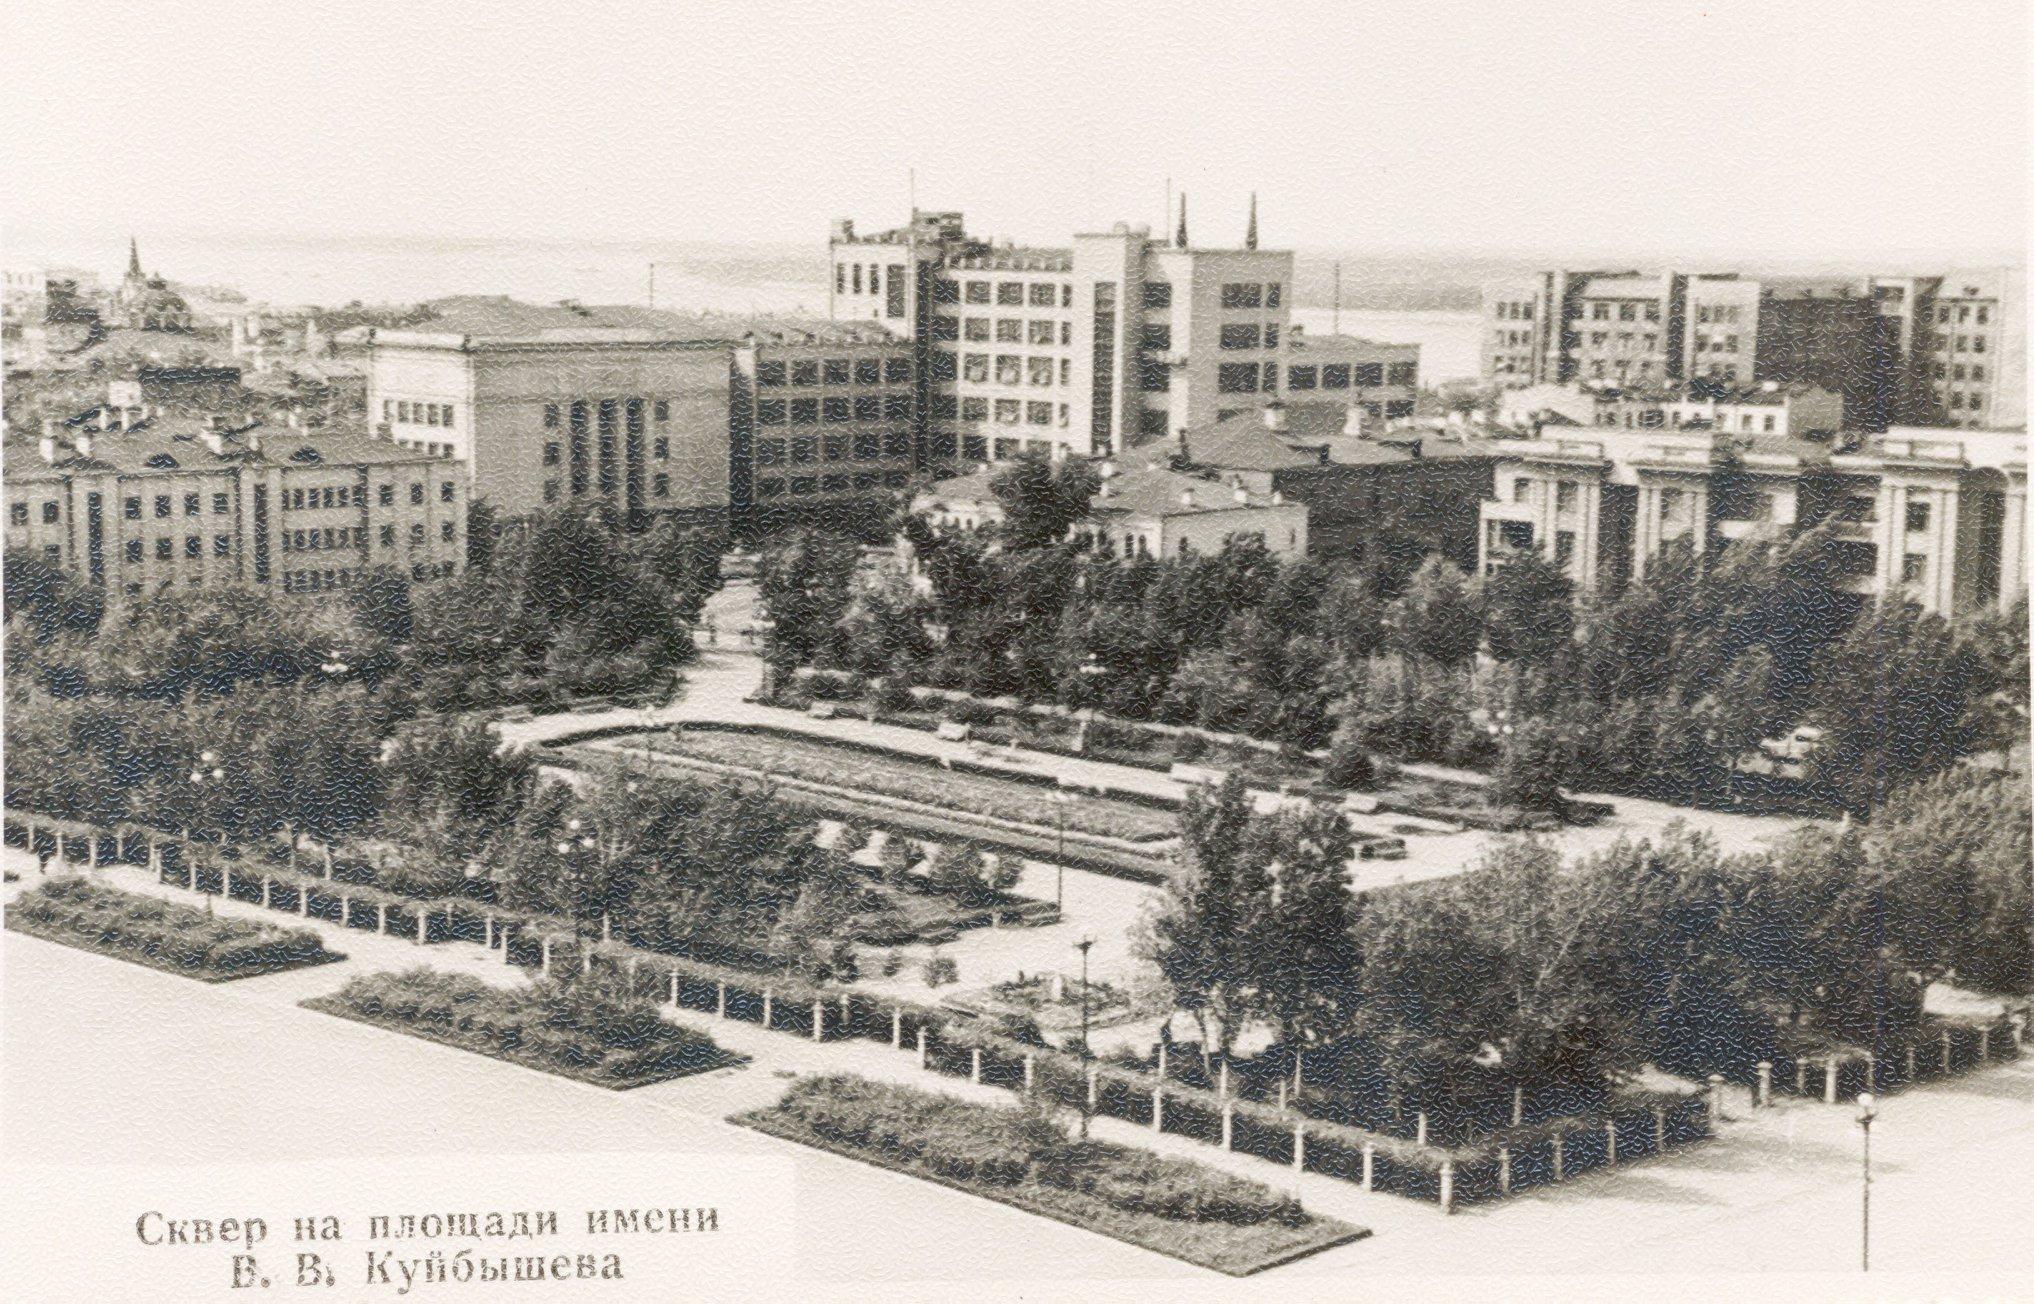 Красноармейская-Чапаевская